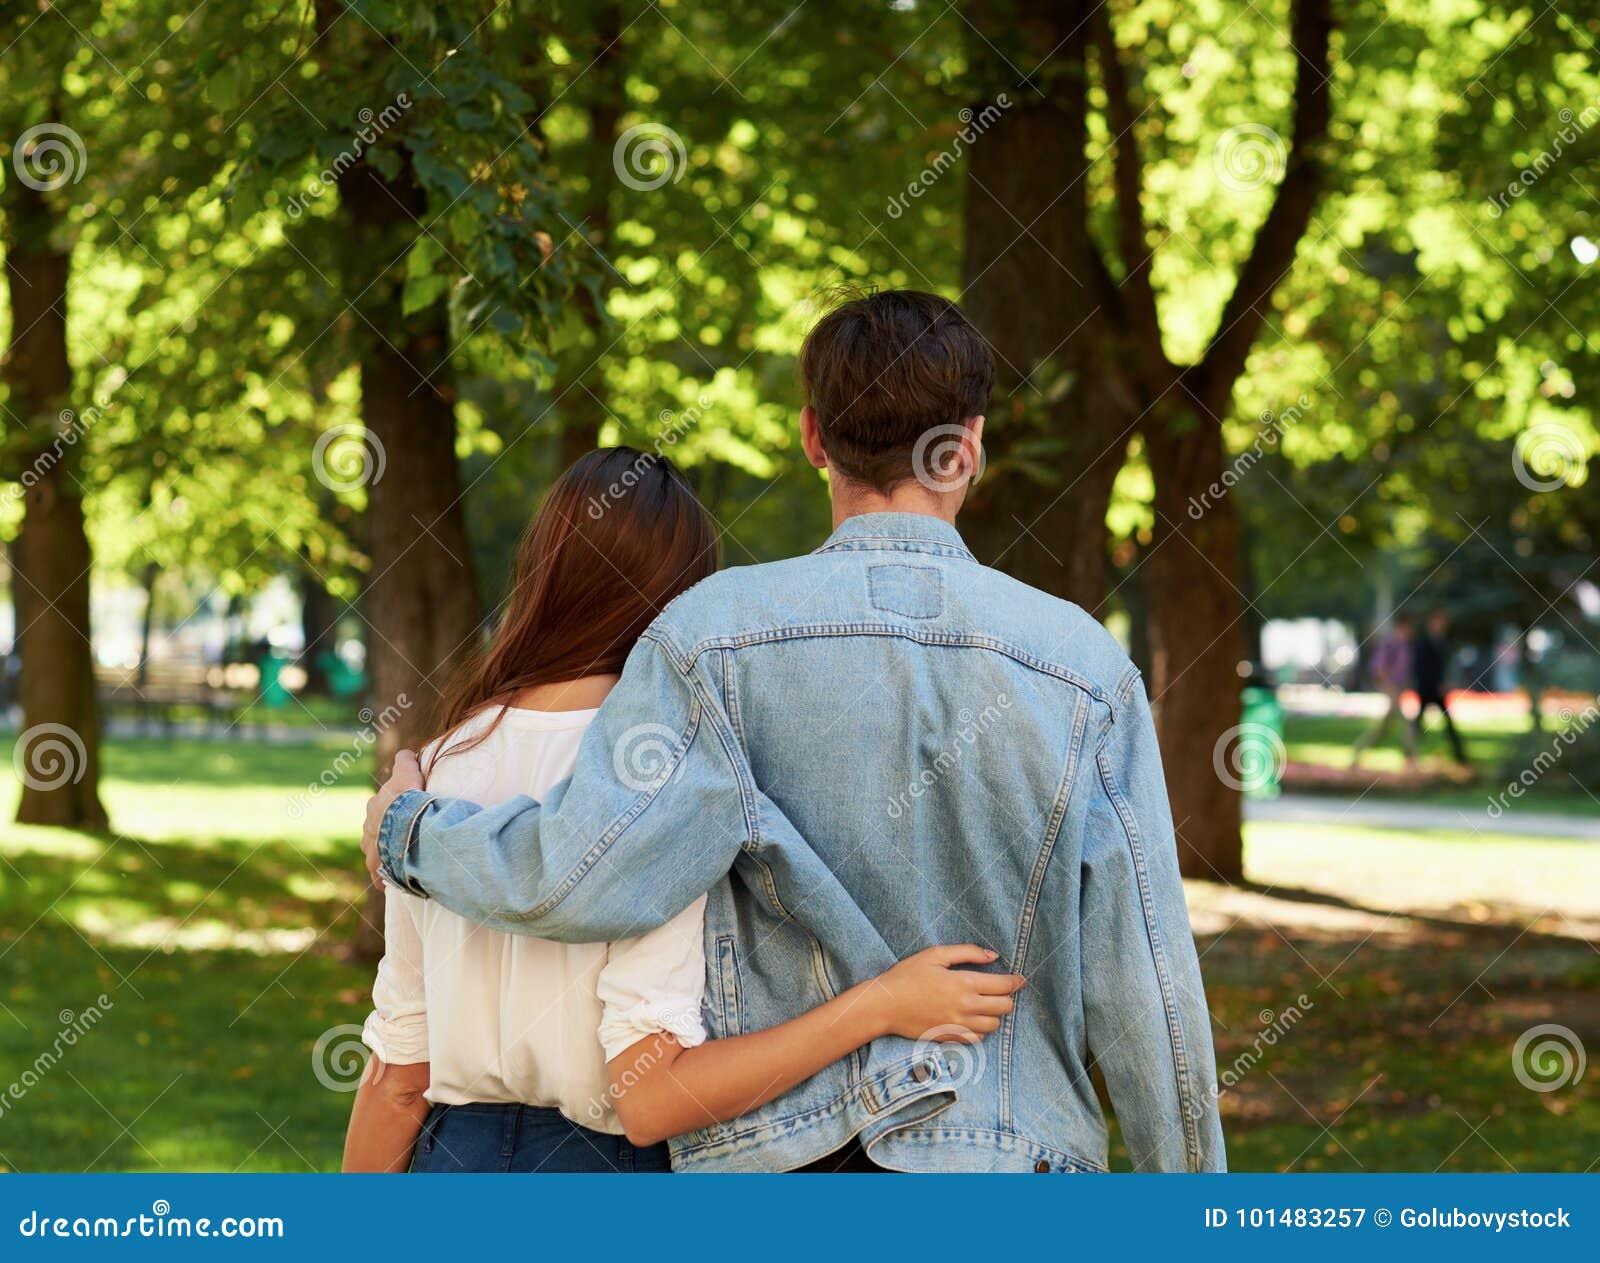 Close Romantic Relationship  Summer Love Stock Image - Image